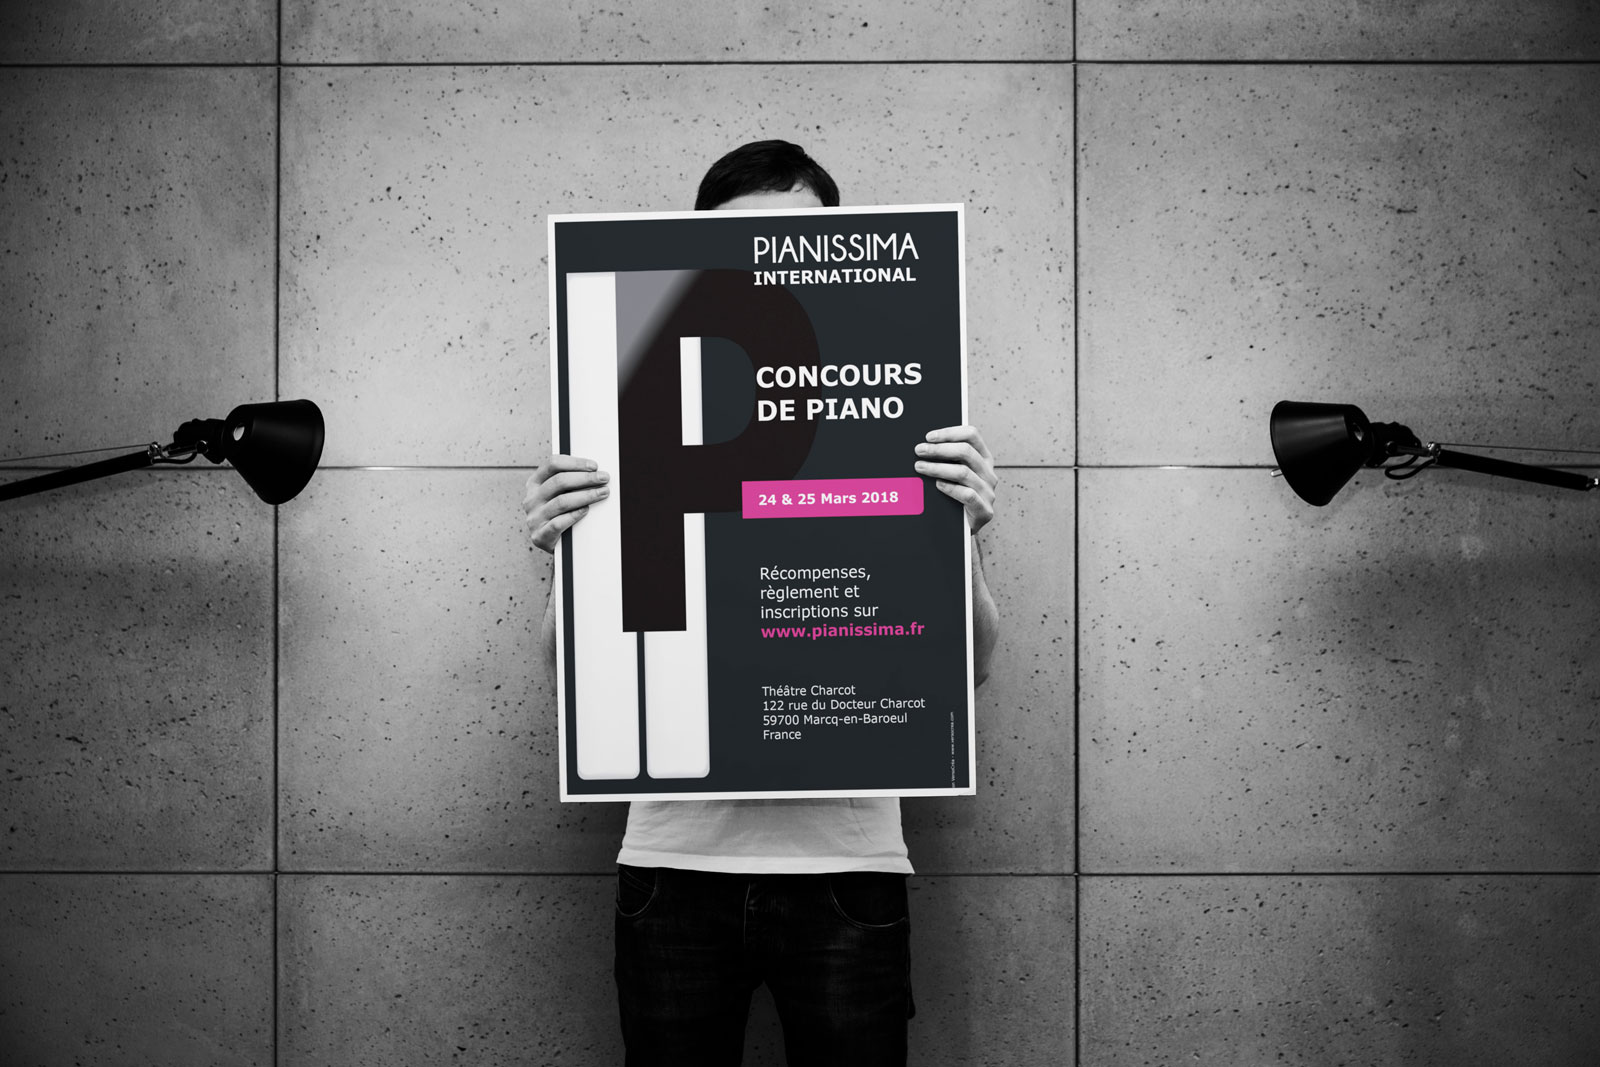 Affiche du concours Pianissima International 2018